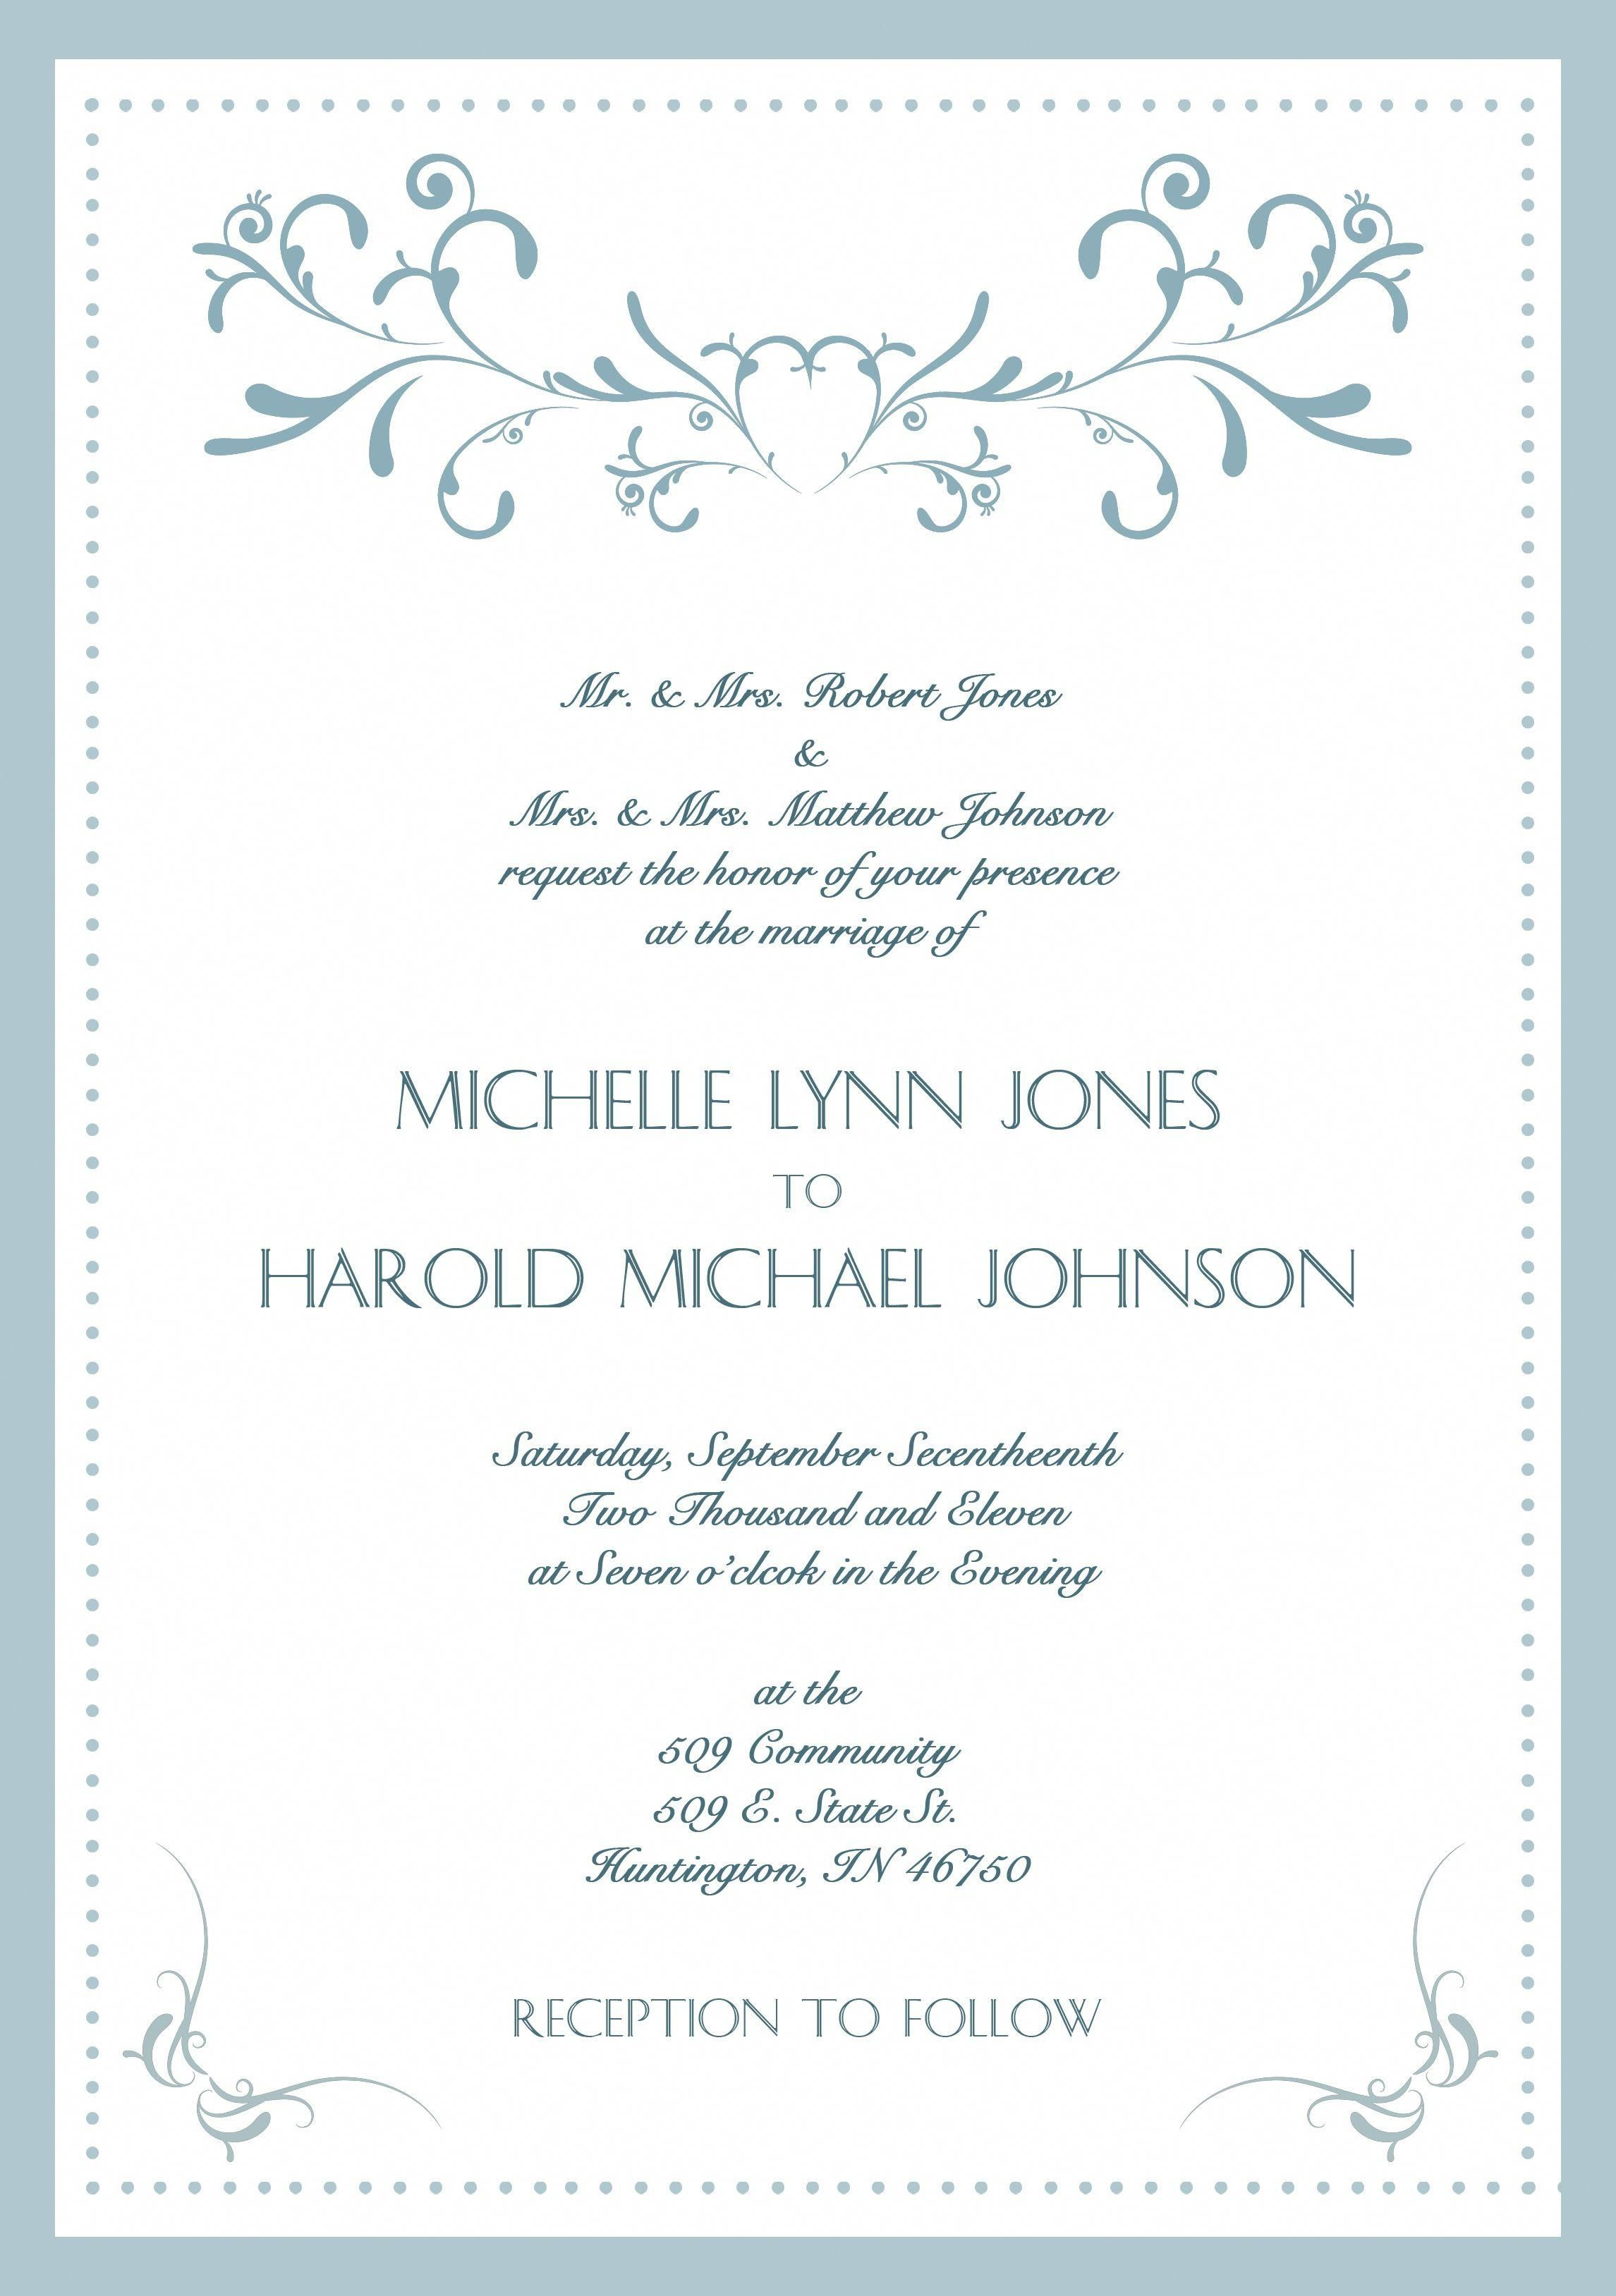 Wedding Invitation Language.20 Wedding Invitation Language Wedding Invitation Language Formal